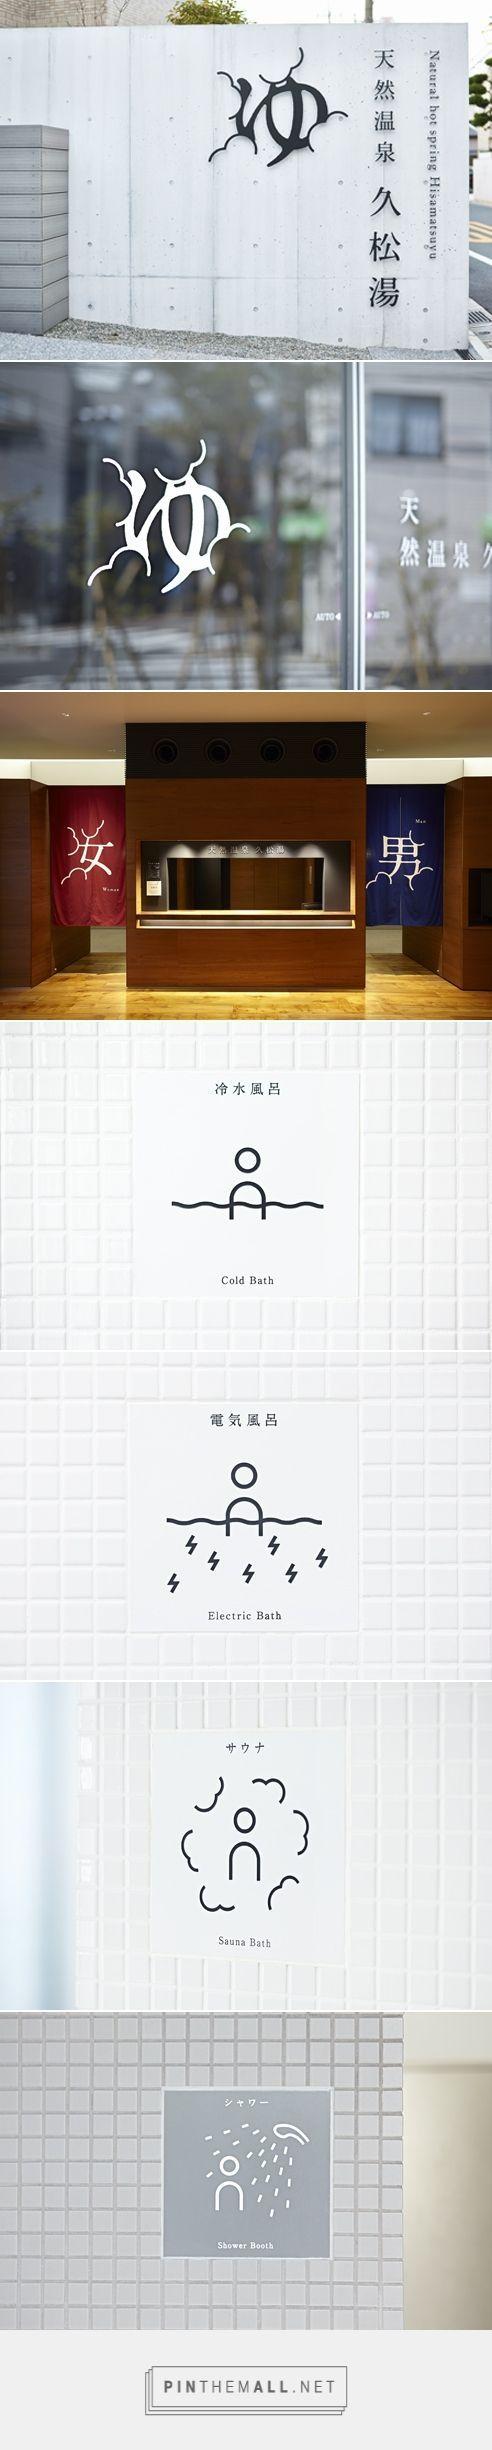 天然温泉 久松湯 | Works | Kishino Shogo(6D)-木住野彰悟 - created via http://pinthemall.net: